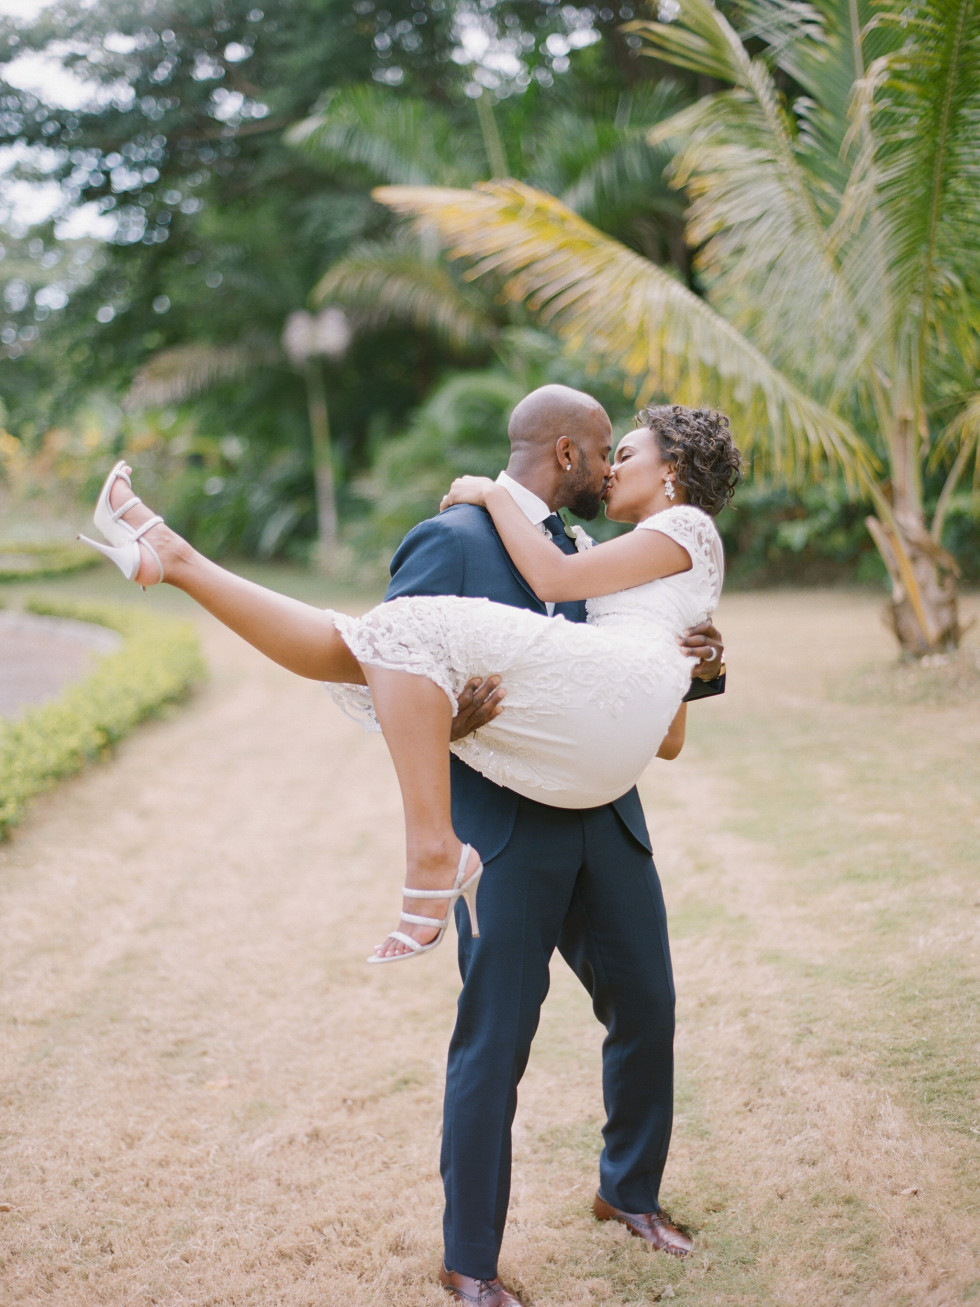 Wonderful Weddings, Kendhal Gardner, Feb. 2016, John Lucas III